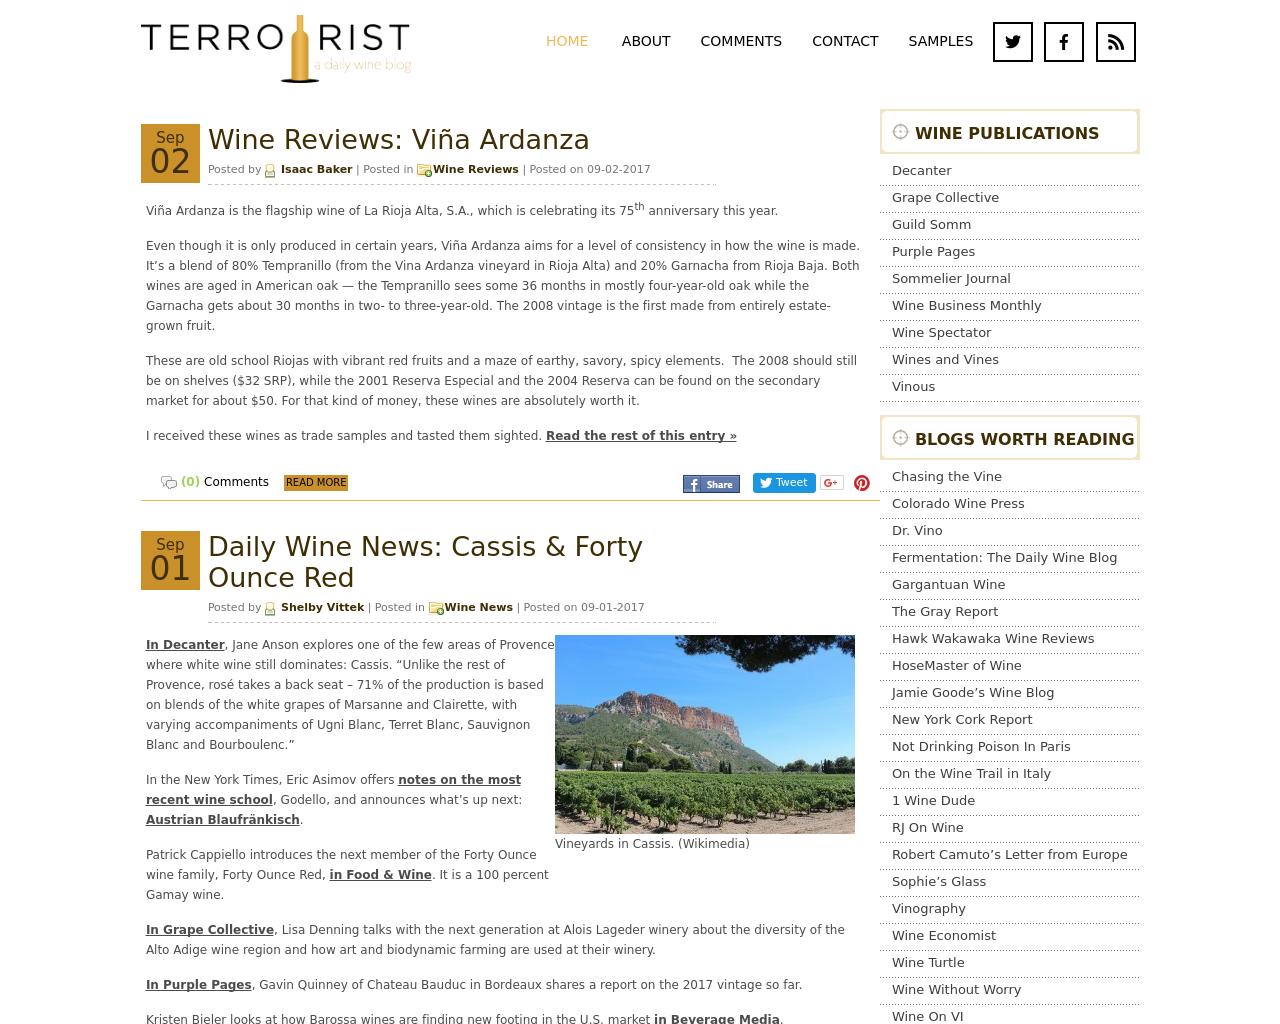 Terrorist-Advertising-Reviews-Pricing